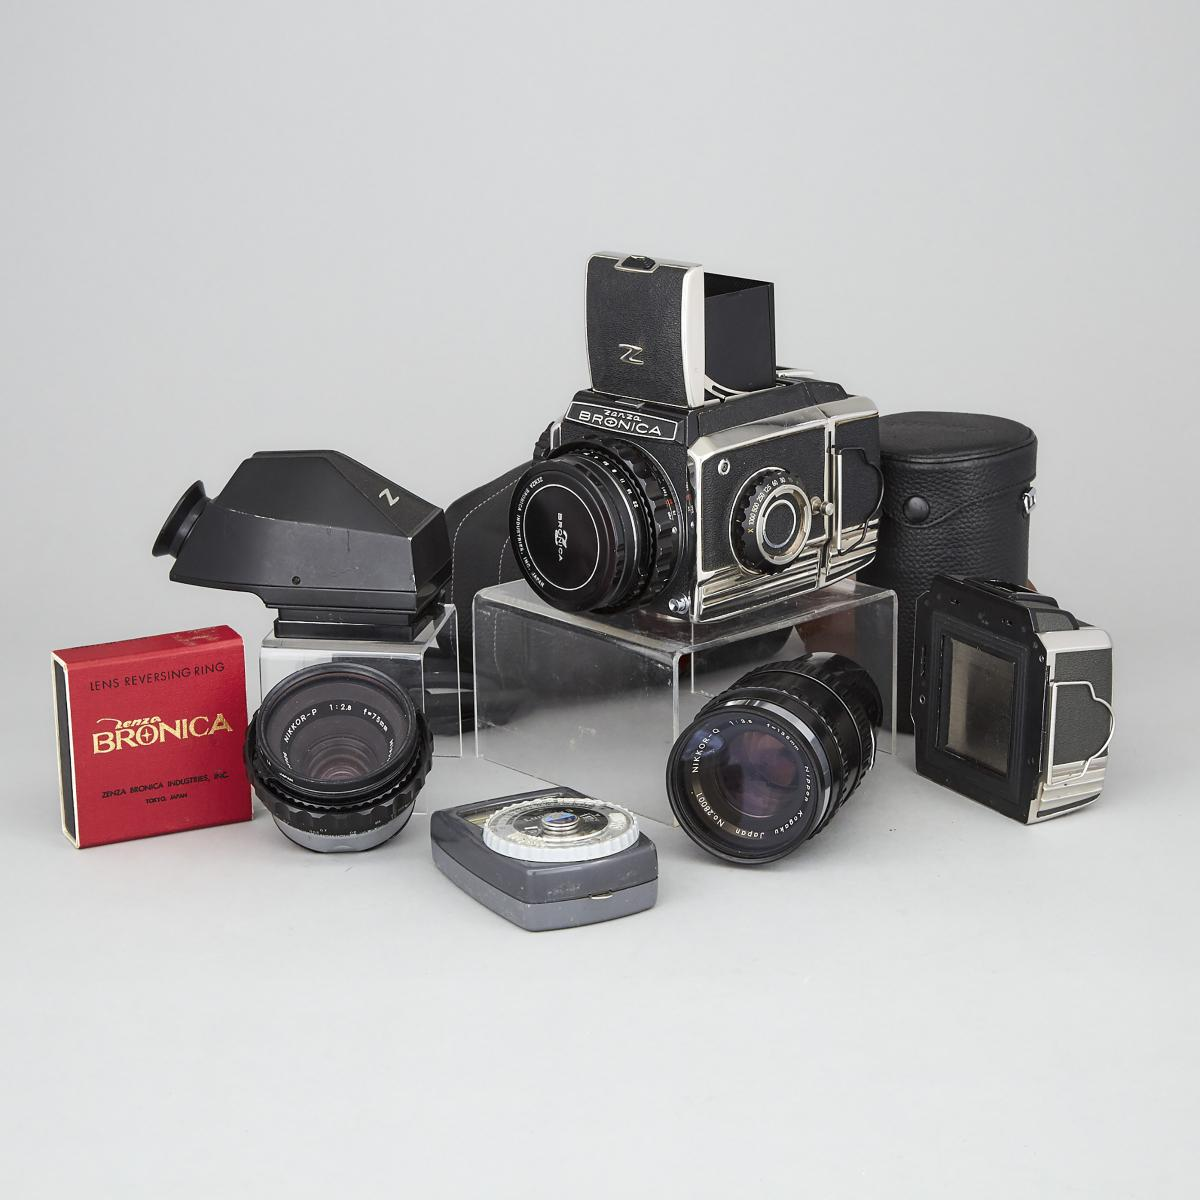 Lot 116 - Zenza Bronica S2 Camera Set, c.1968, camera length 6.9 in — 17.5 cm